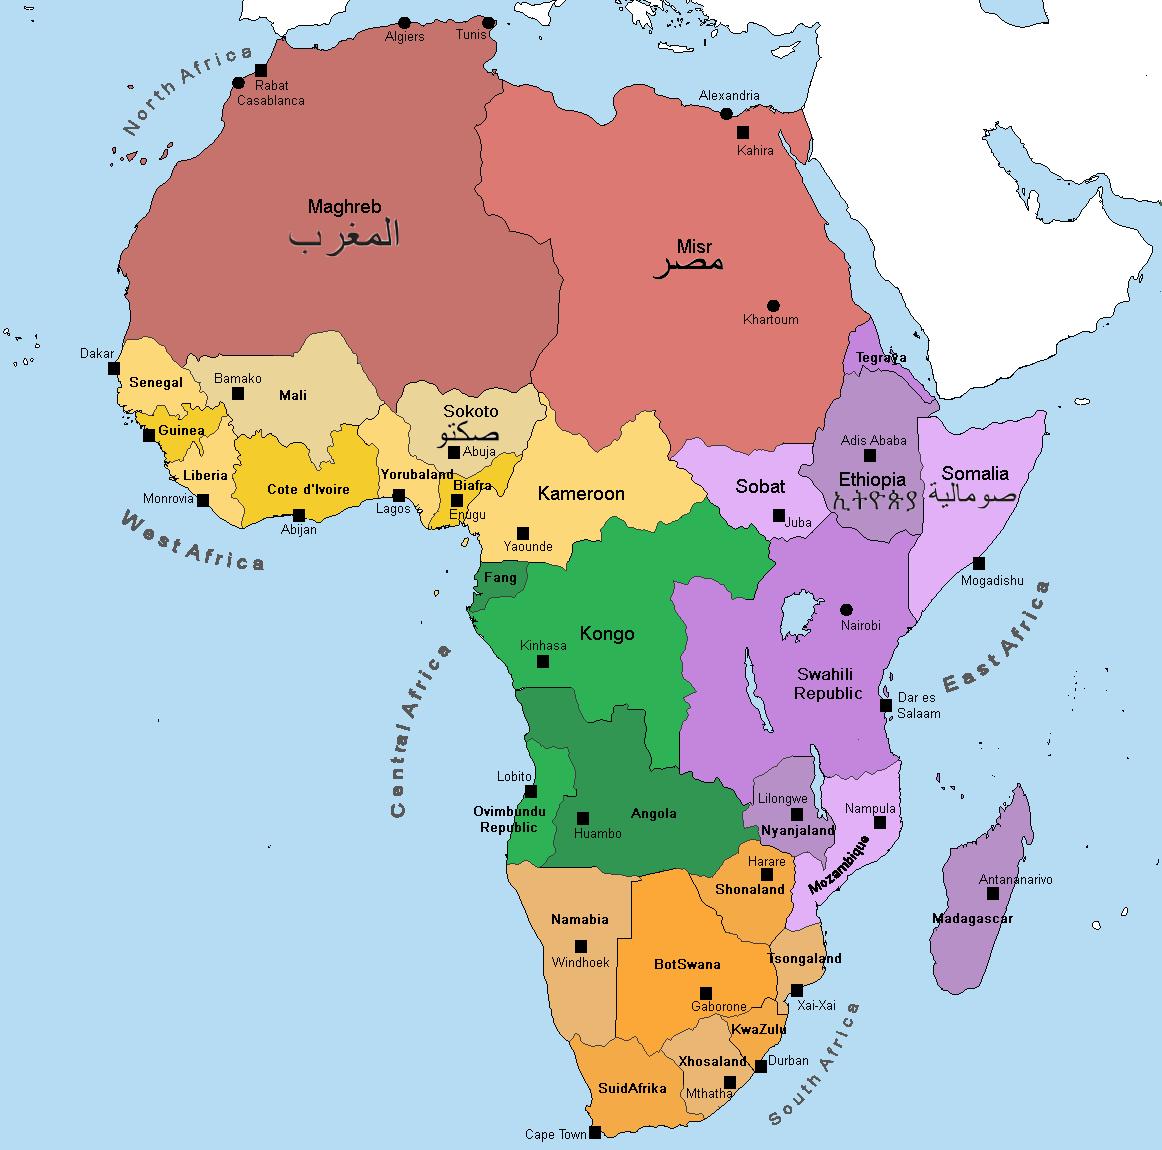 Alternate Africa Map Description In Comments Imaginarymaps